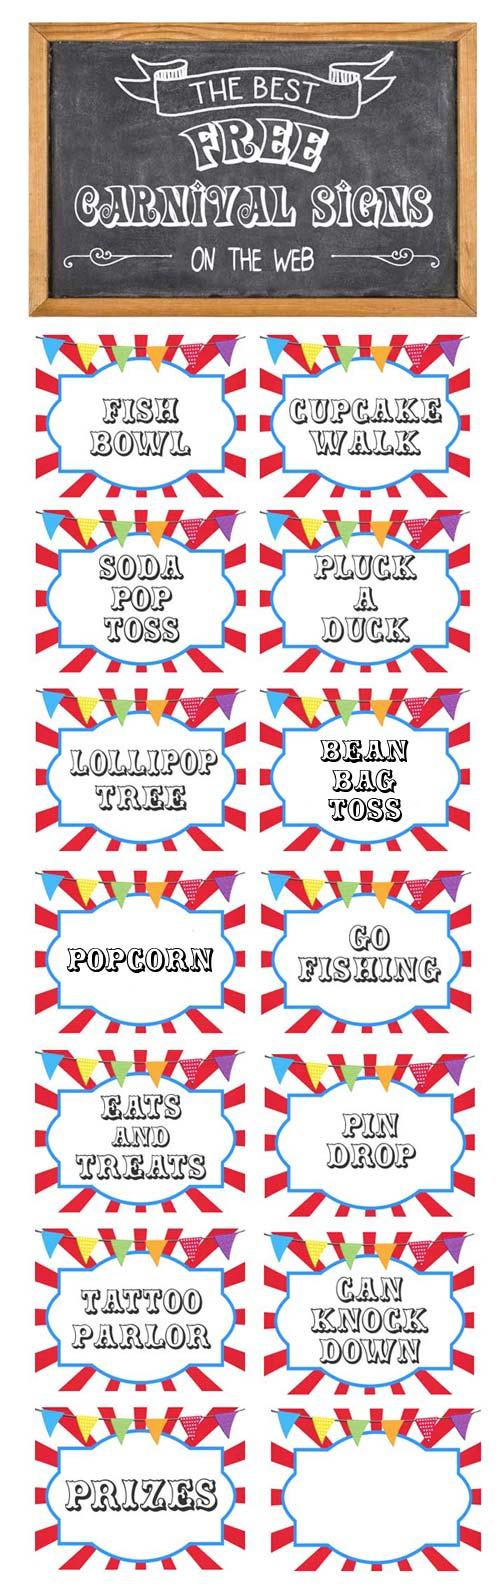 Free Printable Carnival Signs - Free Printable Carnival Signs